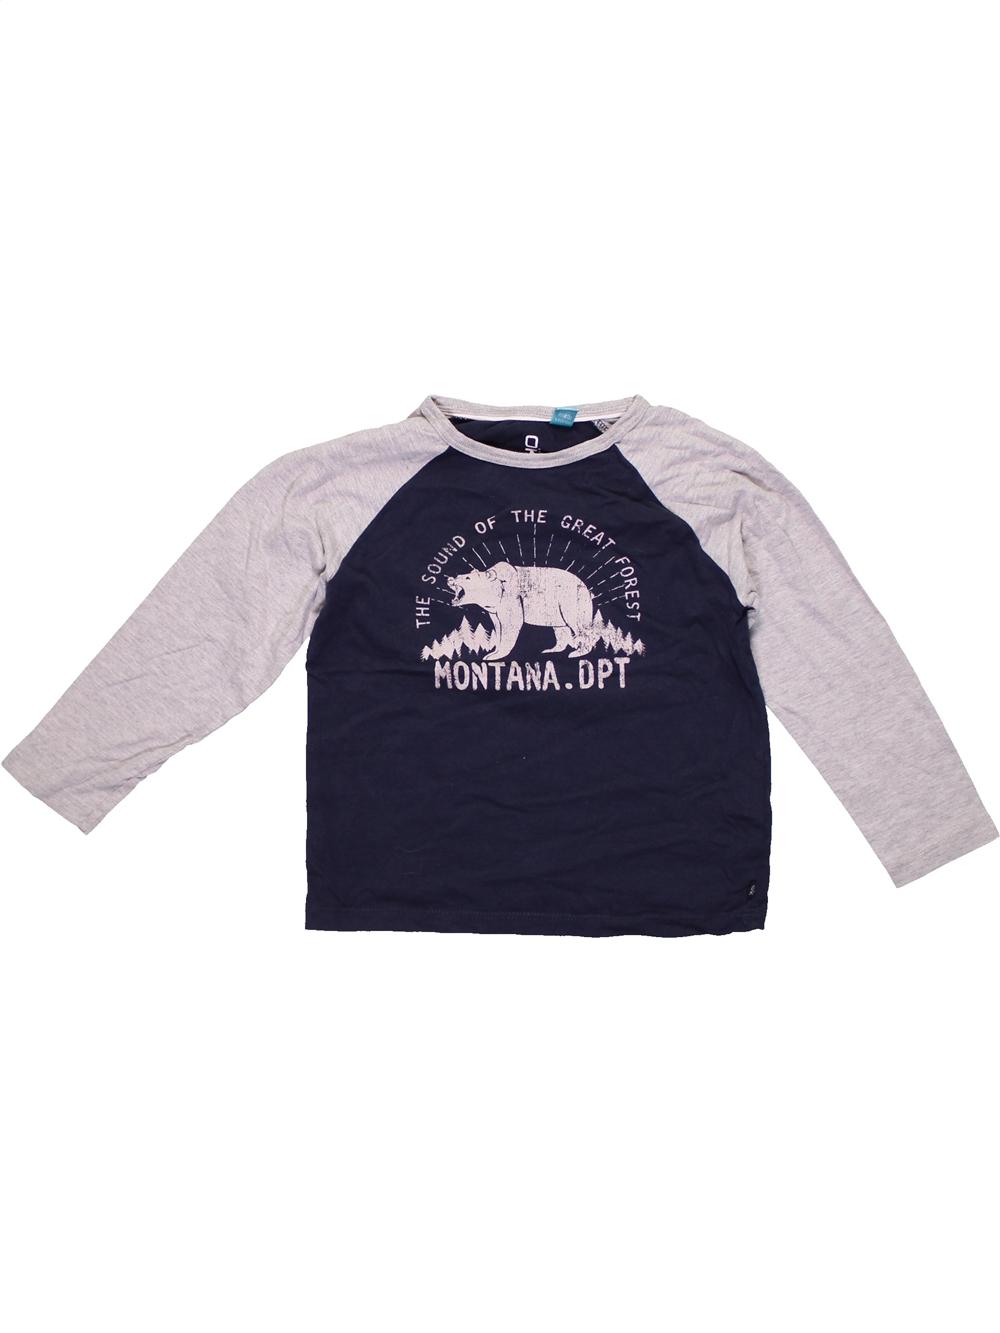 T-shirt-manches-longues-enfant-garA-on-OKAIDI-5-ans-bleu-hiver-vA-tement-bA-bA